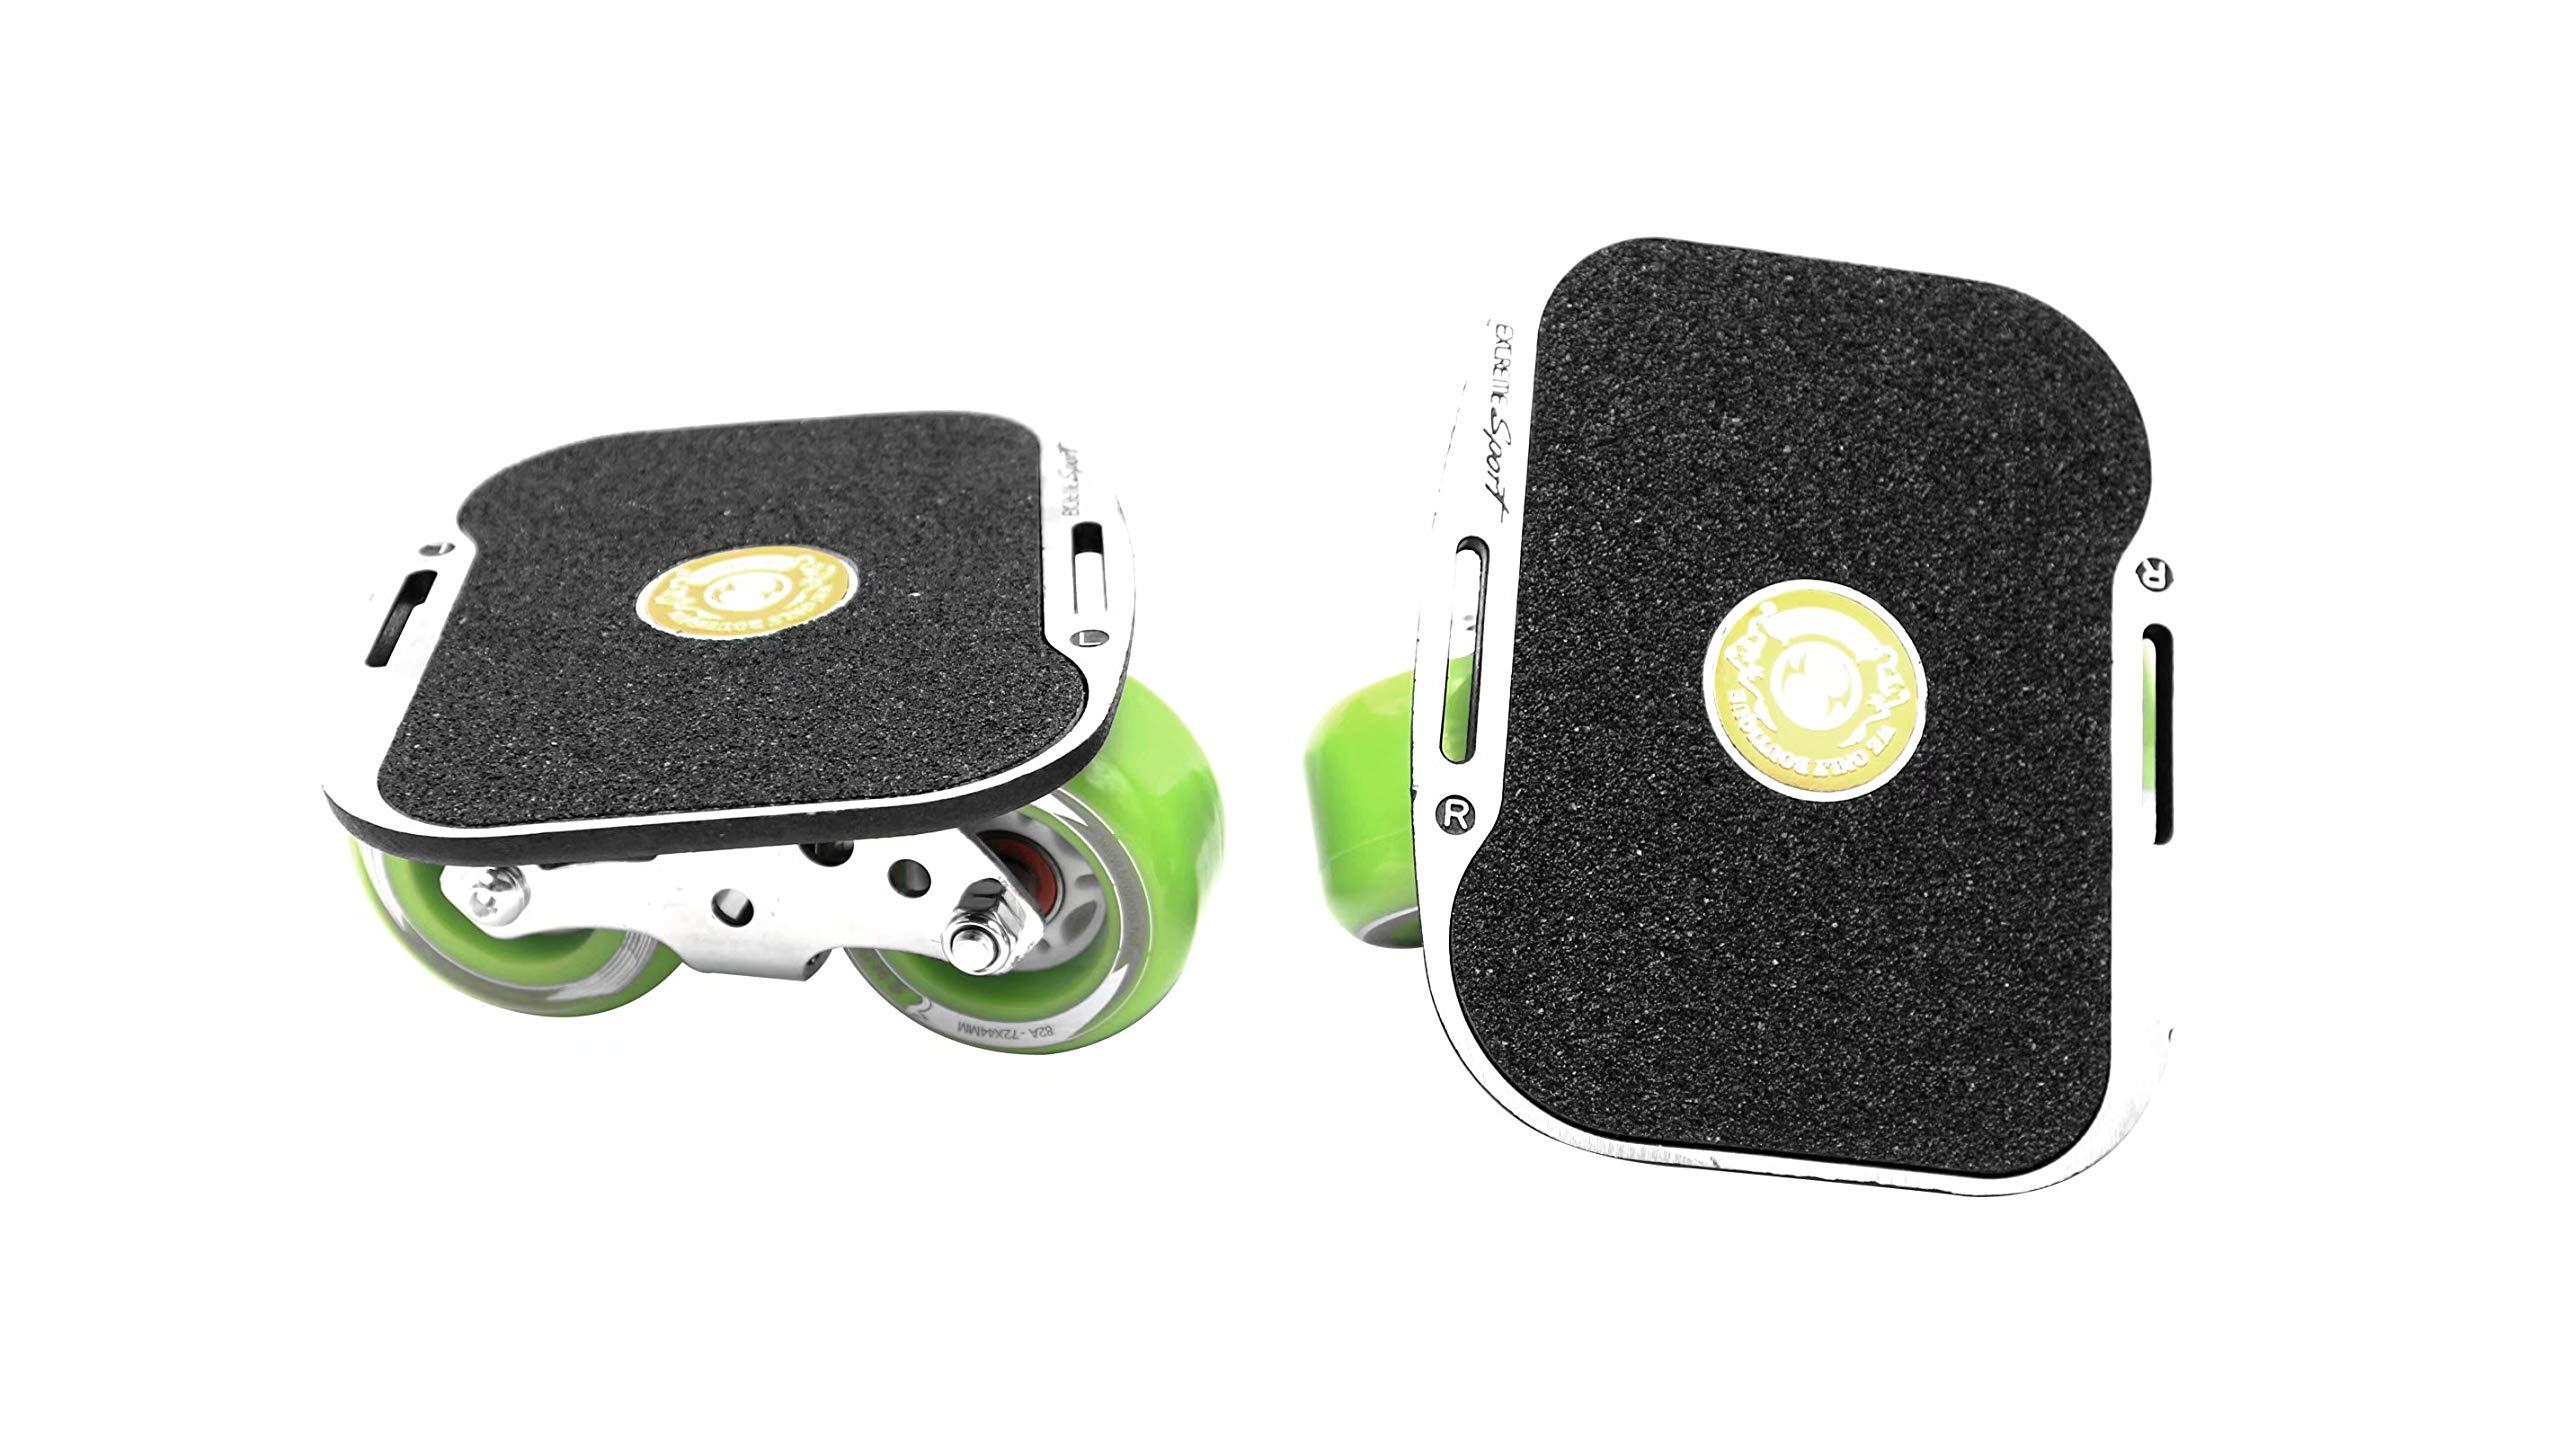 Roller Road Drift Skates Plate Pro Skates Anti-Slip Board Portable Split Skateboard All-in-one Aluminum Alloy with PU Wheels(Green)